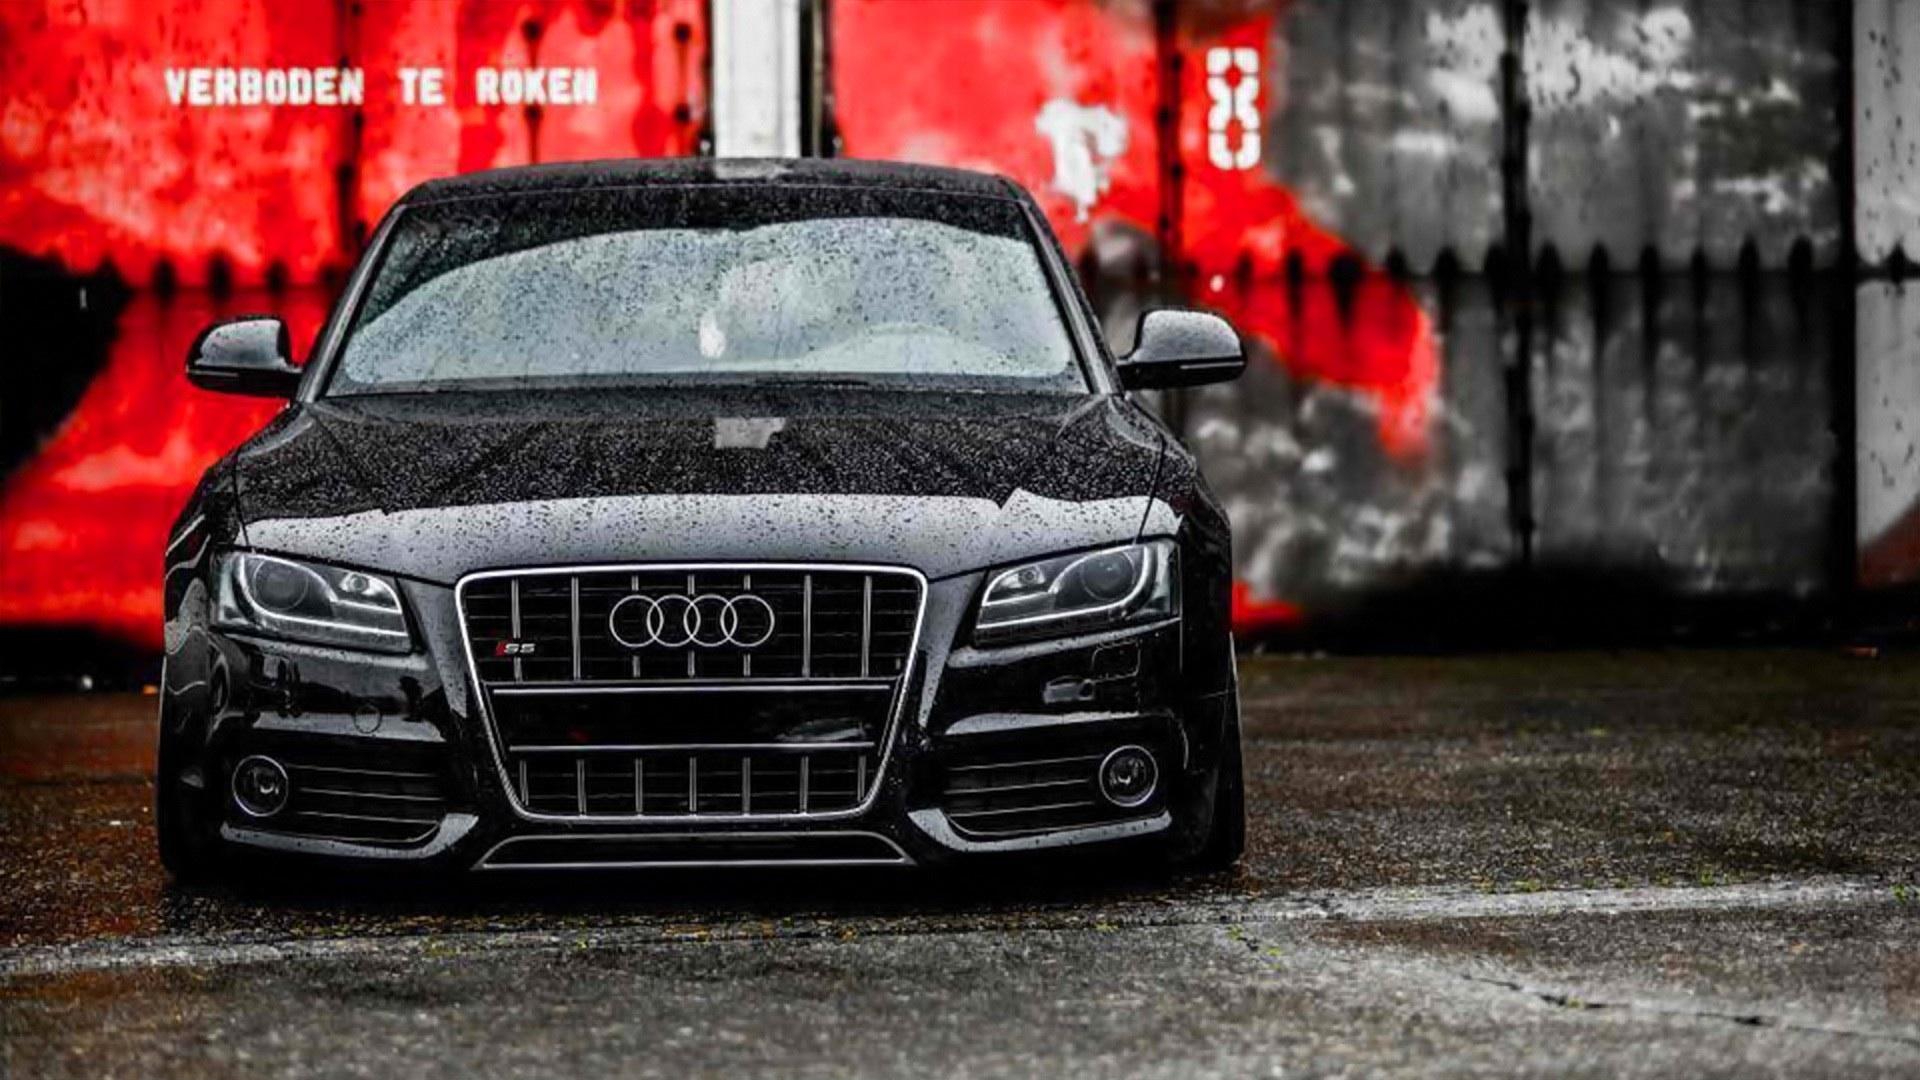 Amazing Audi RS5 Wallpaper